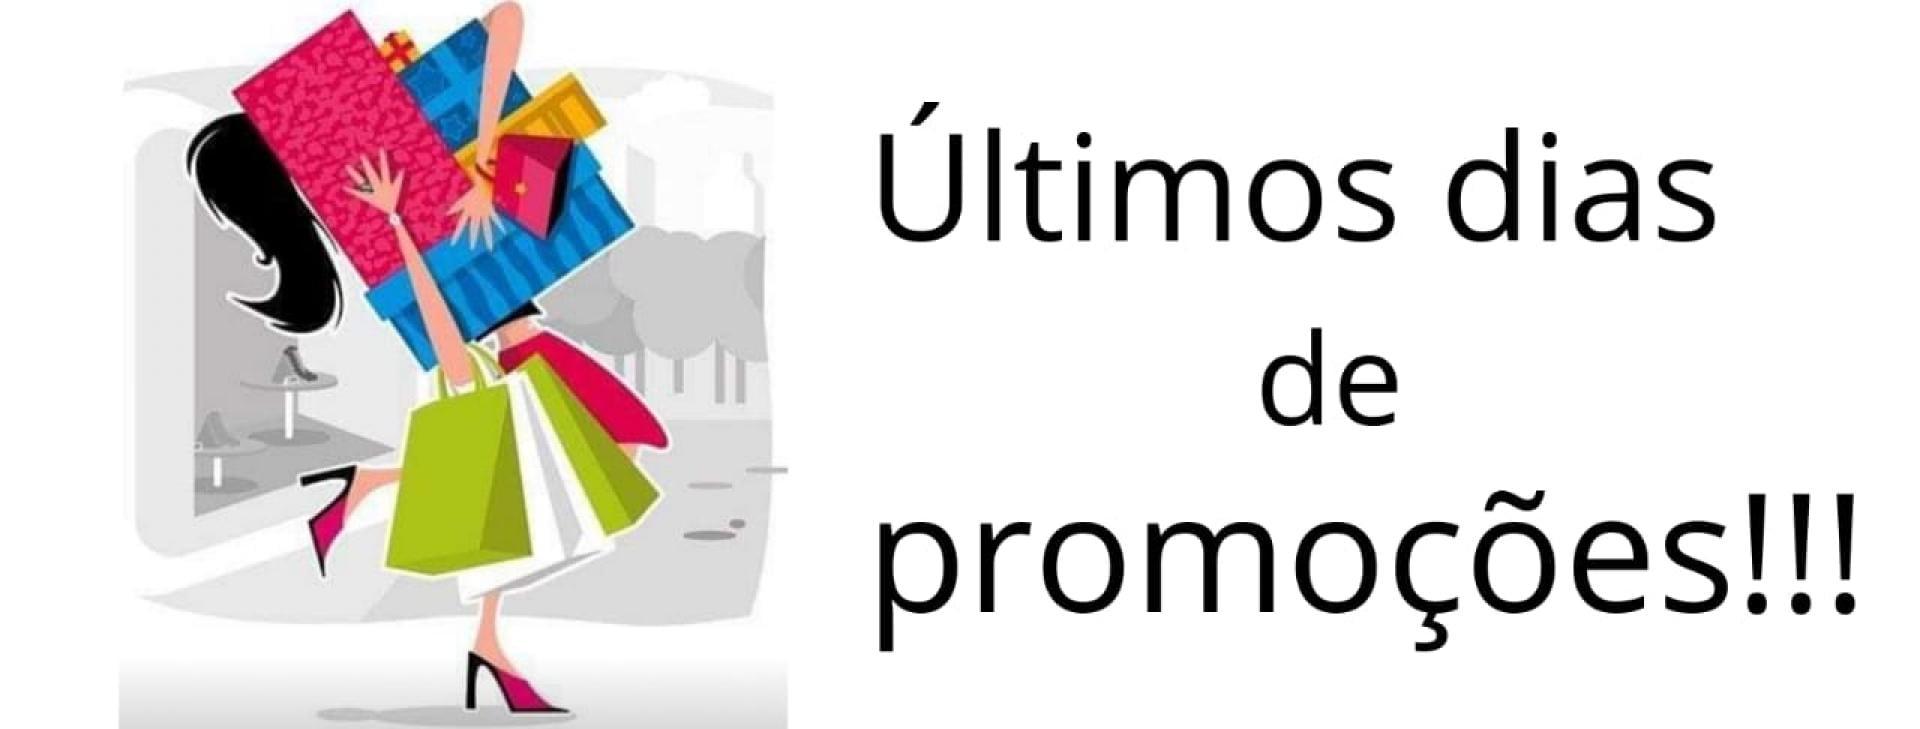 Promoções